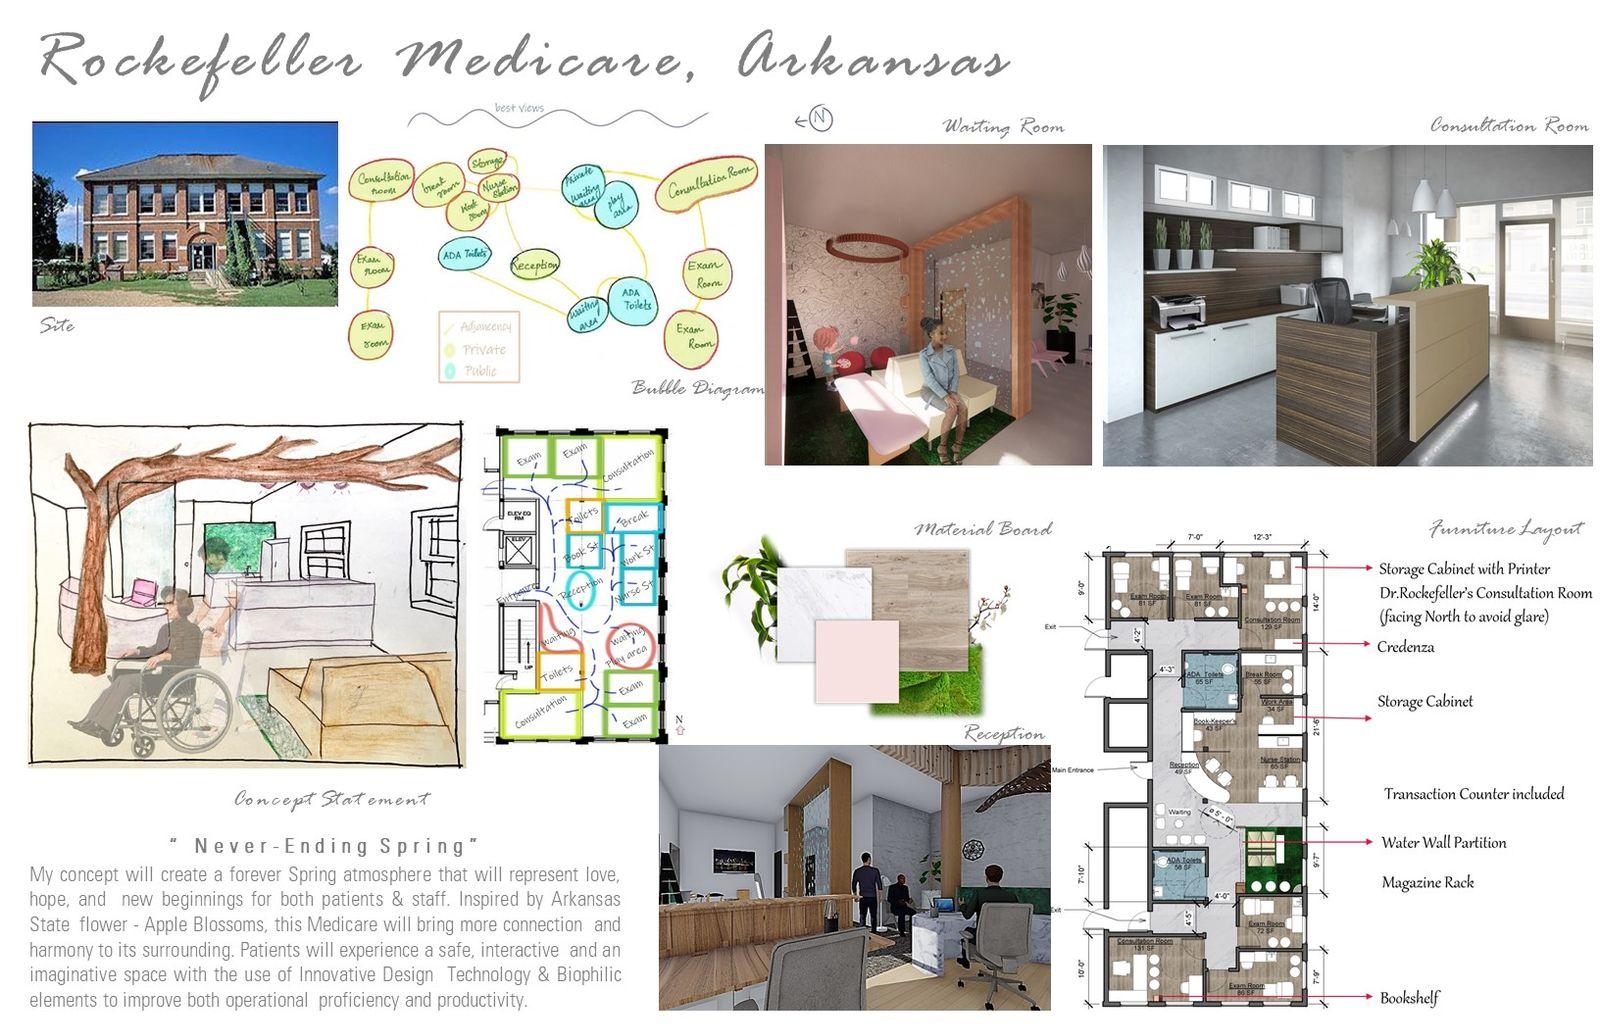 Medicare Center, Arkansas - Design Process